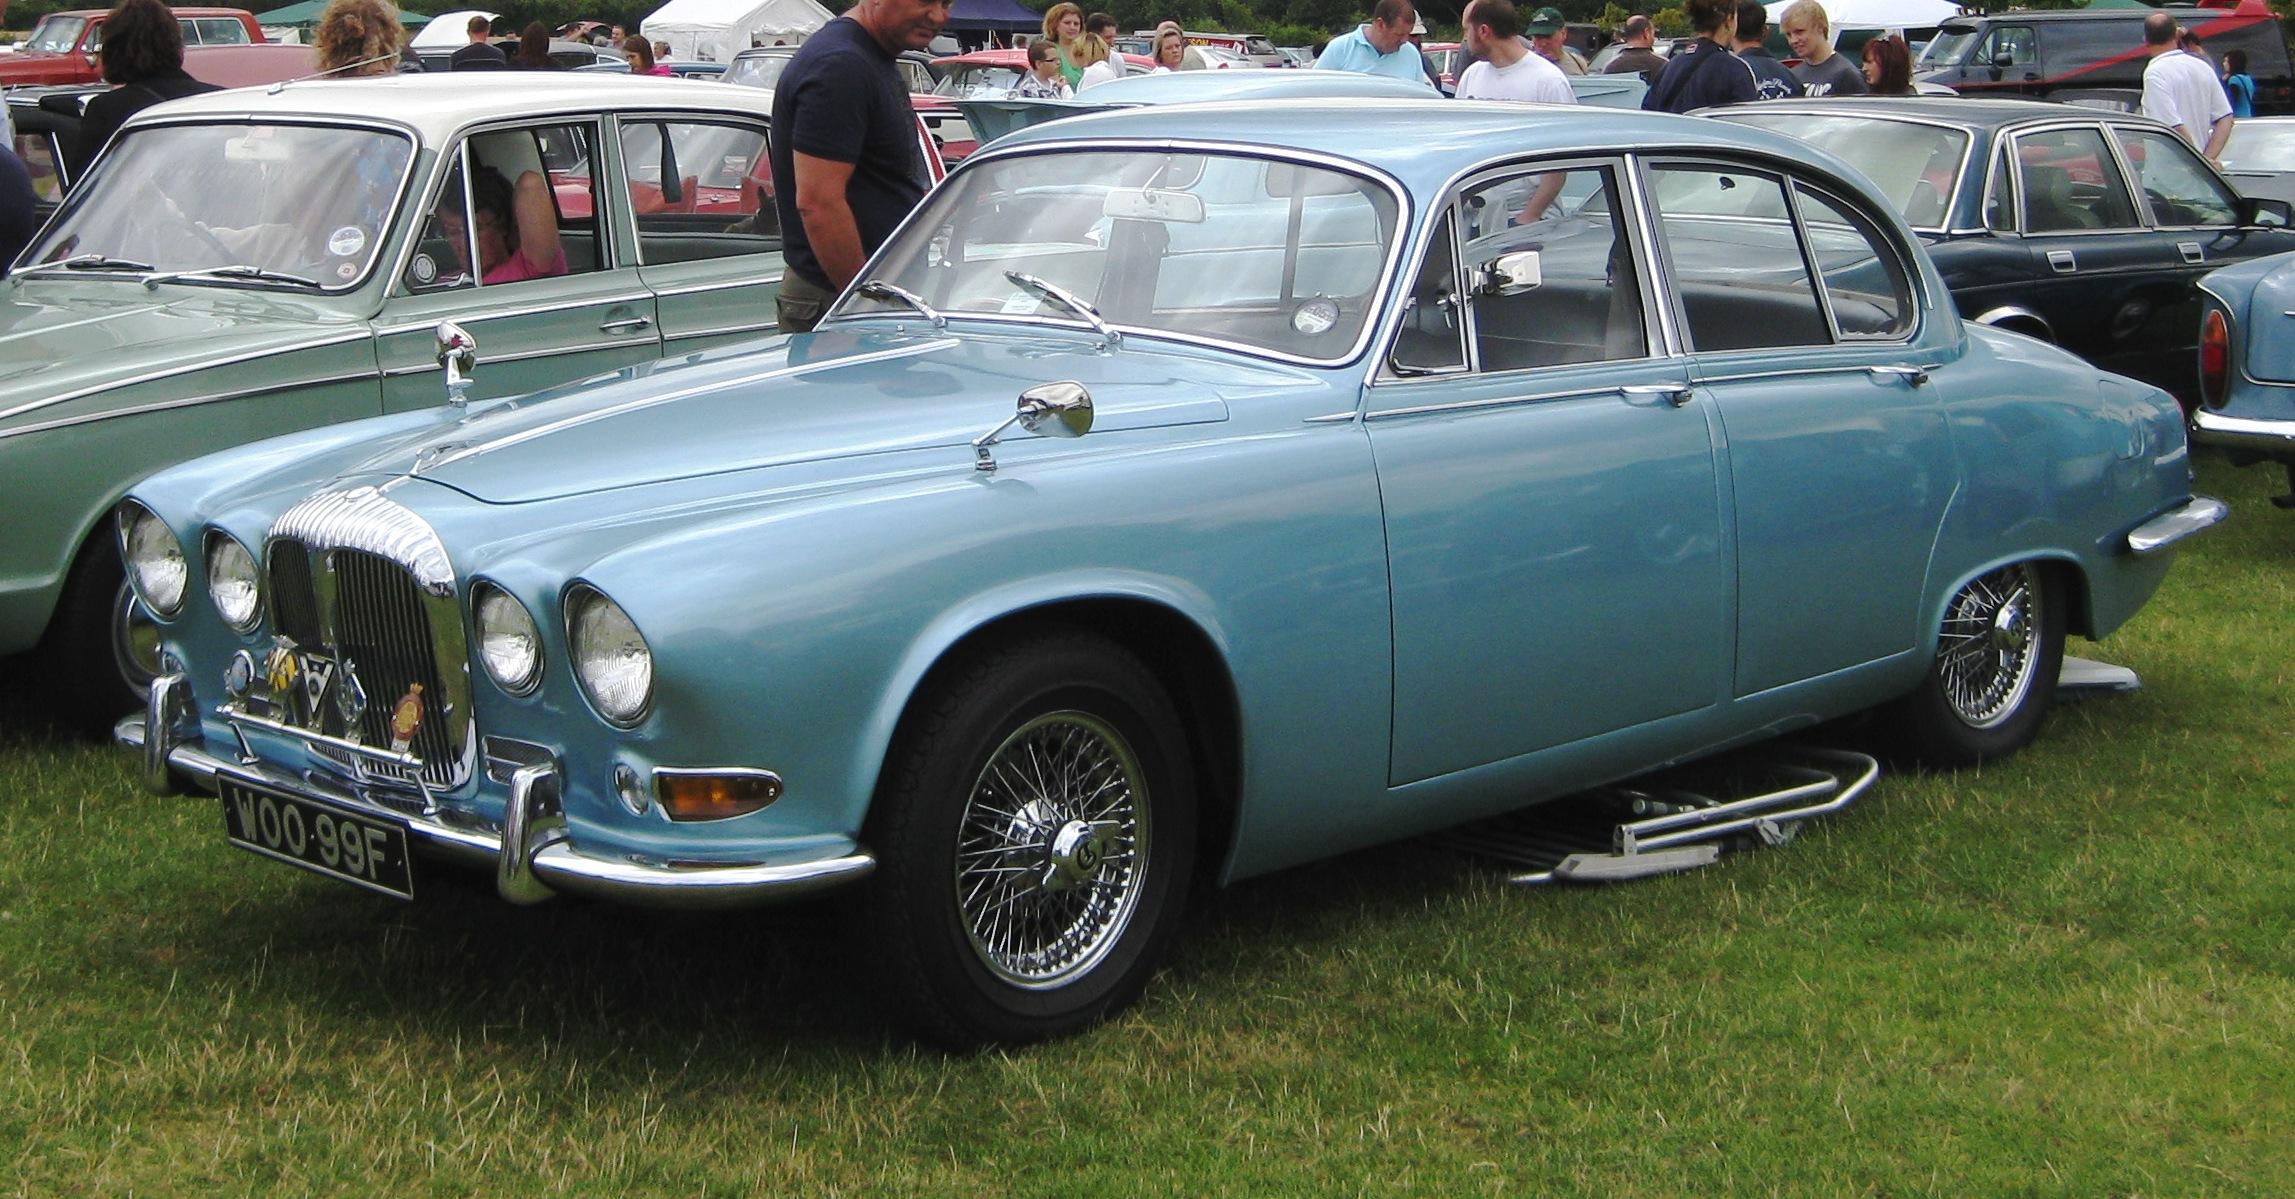 File:Daimler Sovereign 4235cc October 1967.JPG - Wikimedia ...